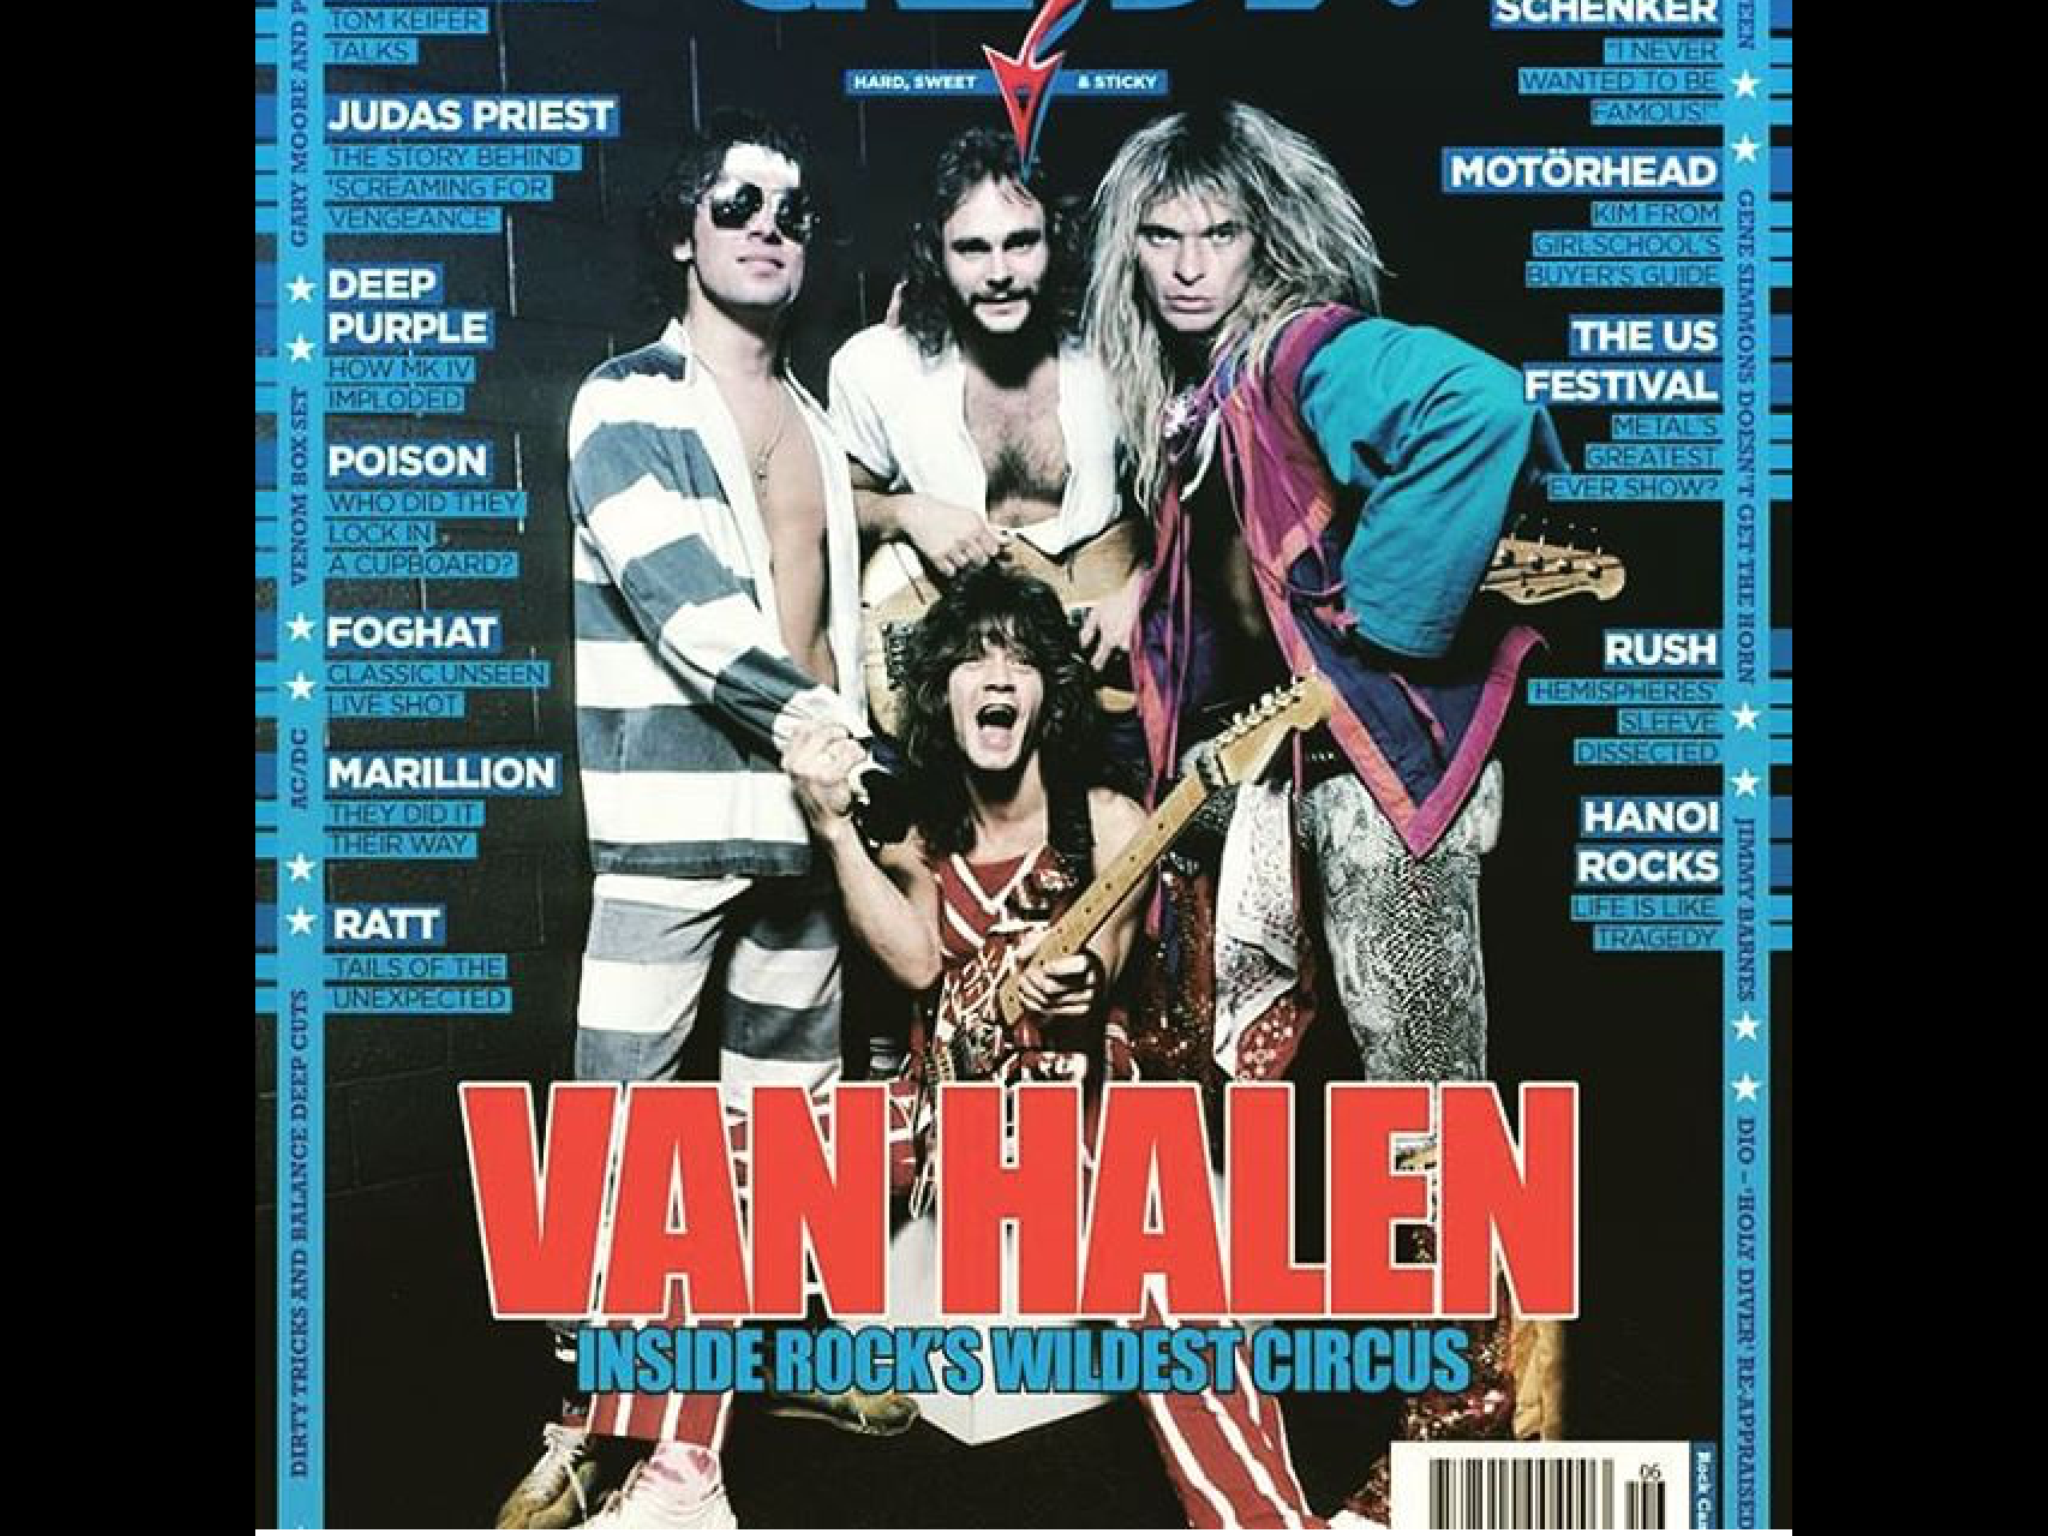 Alex Van Halen Michael Anthony David Lee Roth Eddie Van Halen Alex Van Halen Van Halen Eddie Van Halen